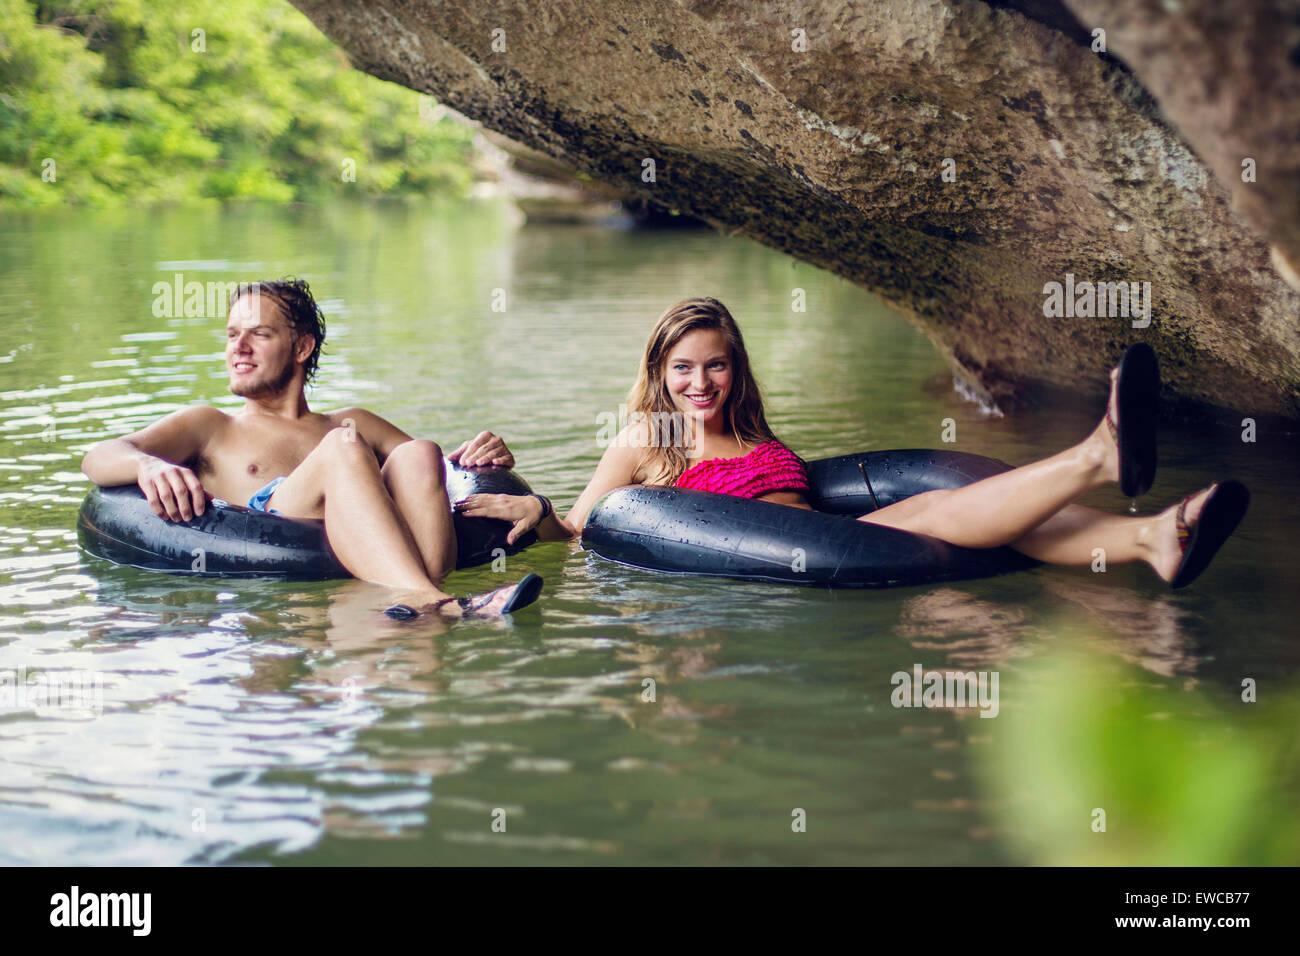 Ein junges Paar Röhren einen Fluss hinunter. Stockbild